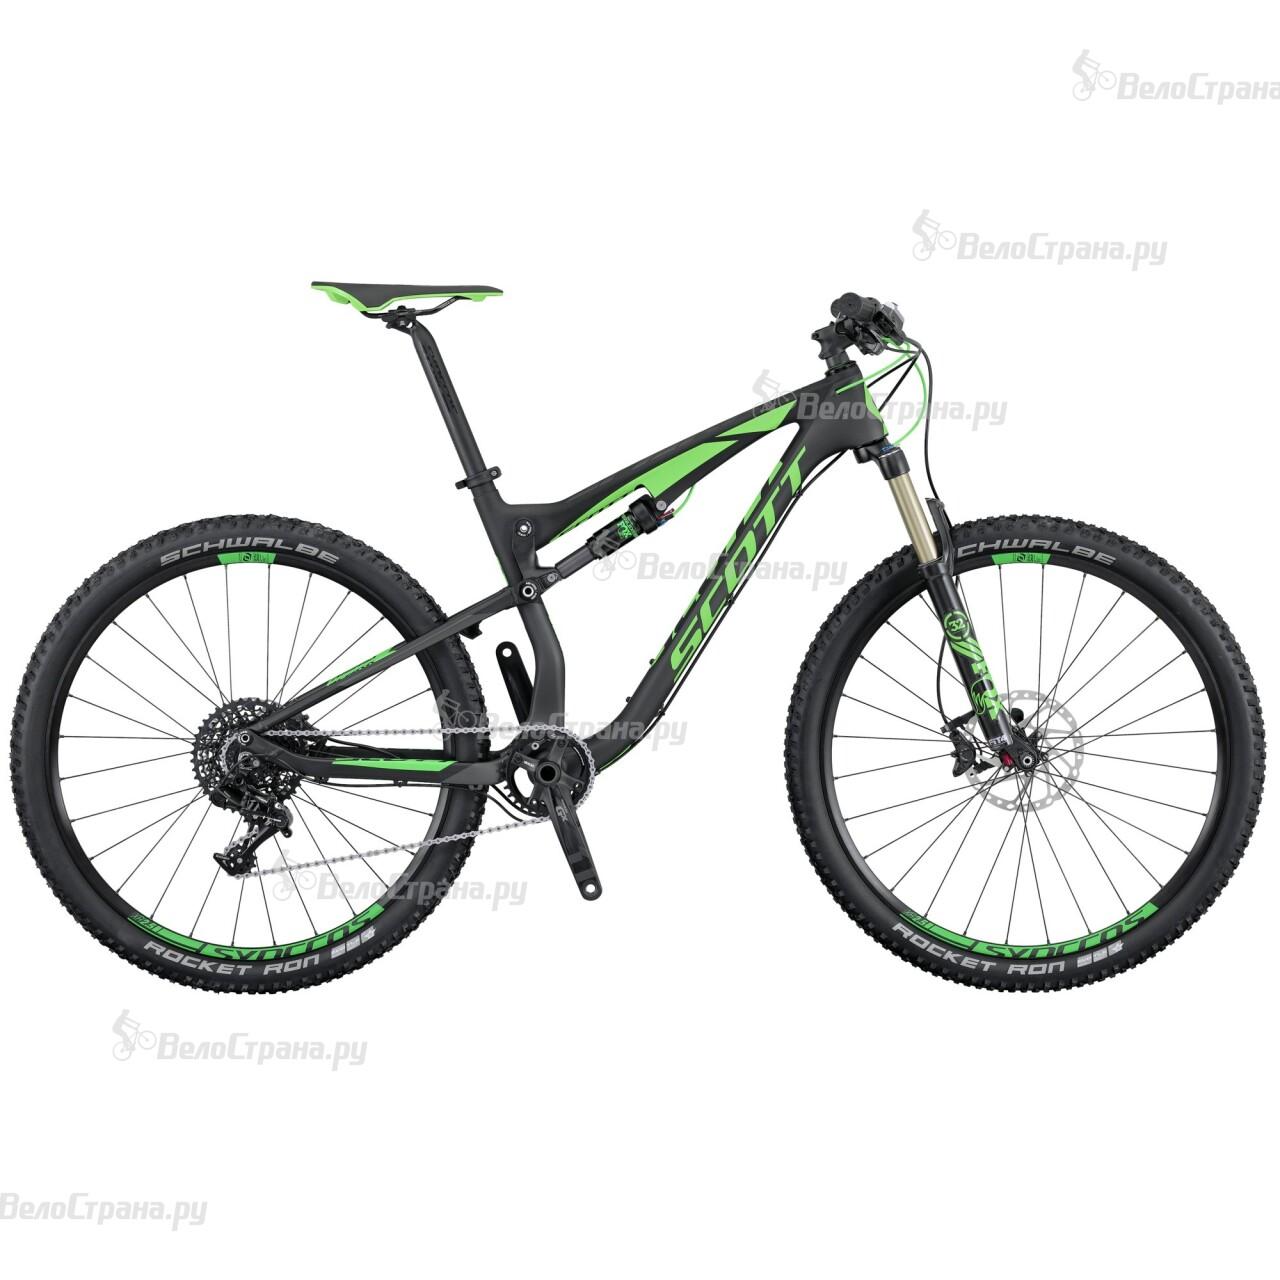 Велосипед Scott Spark 920 (2016) телефон wileyfox spark